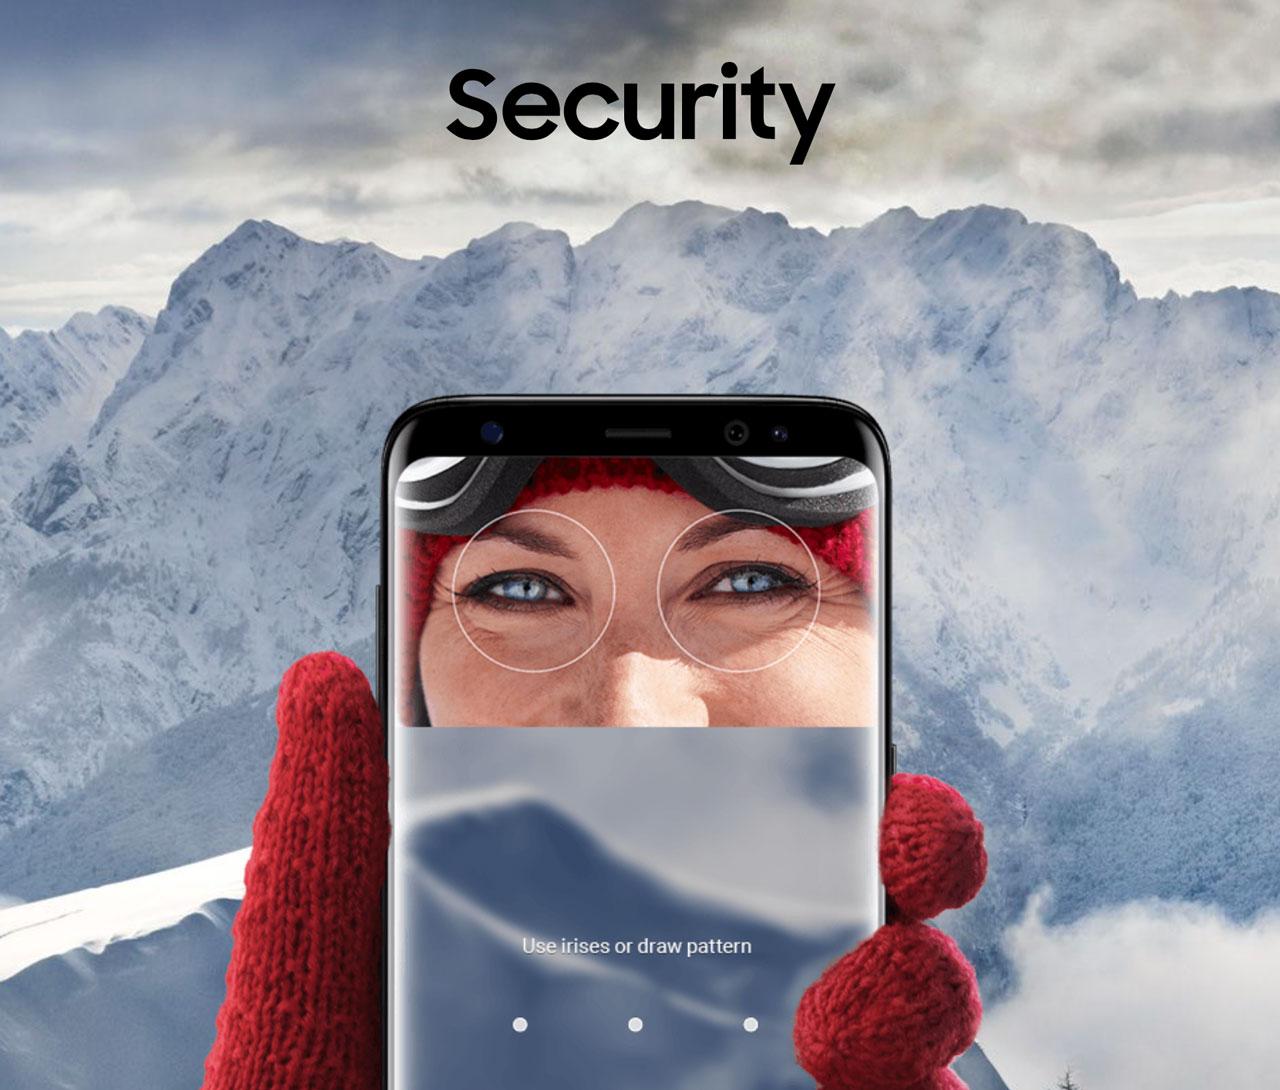 galaxy-s8-security-iris-scanning